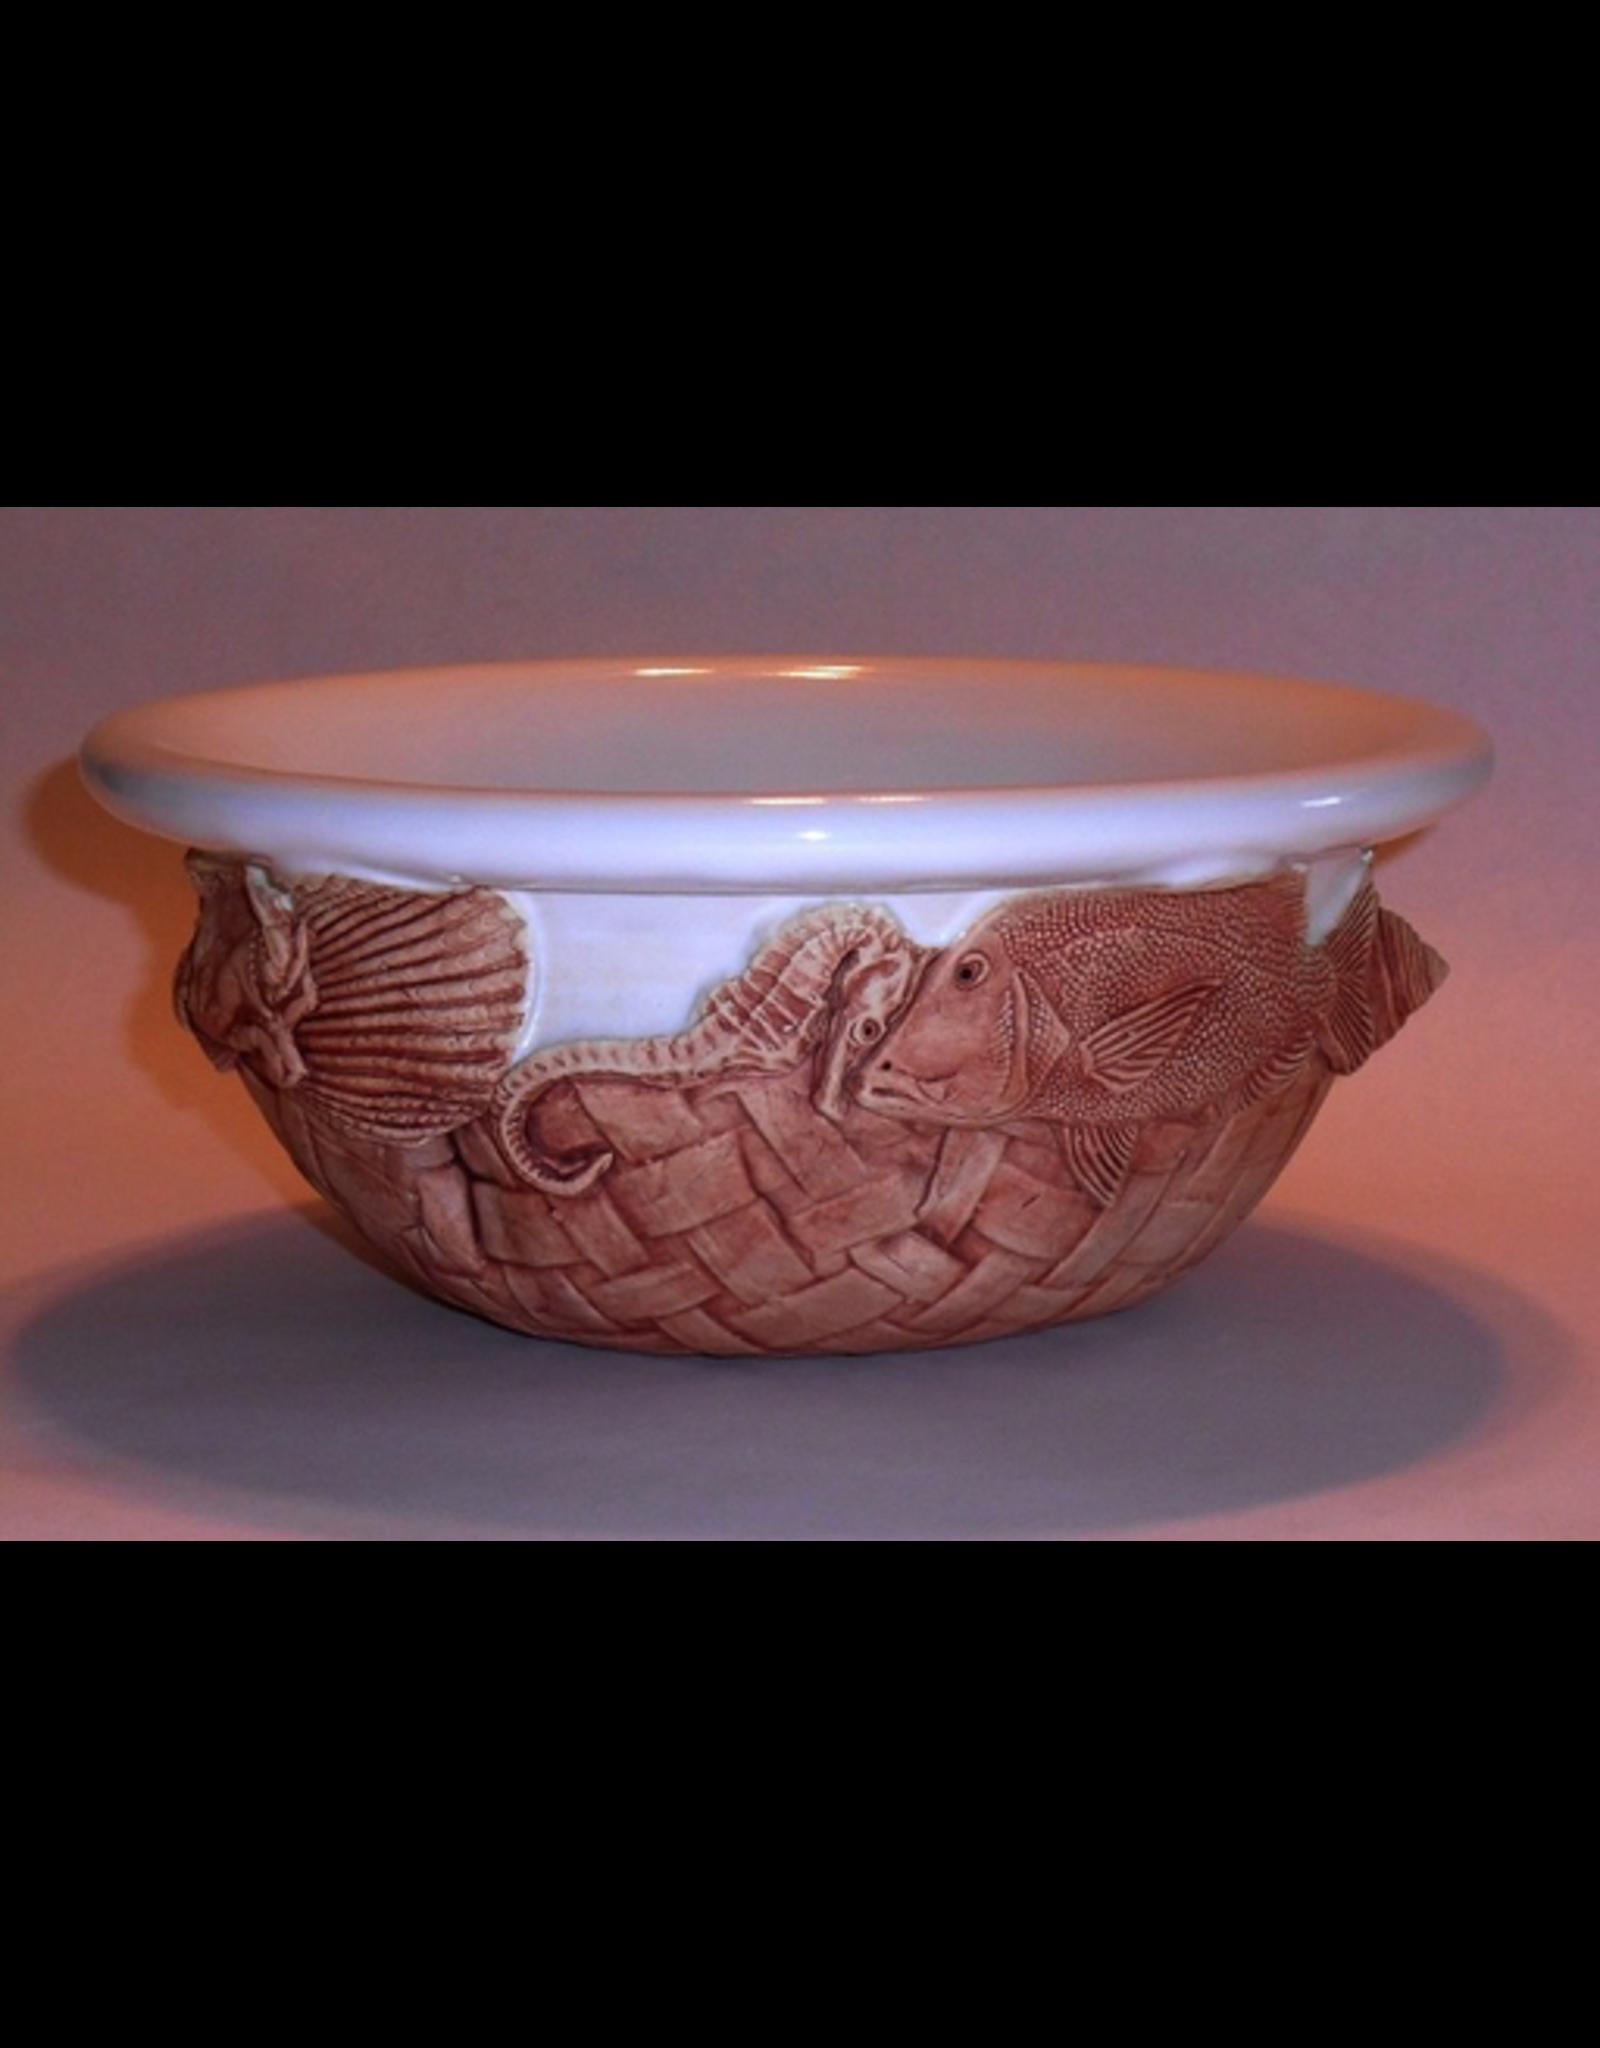 Charlestowne Porcelaine BOWL (2 Qt., Salad, RND, #31, CHAP)